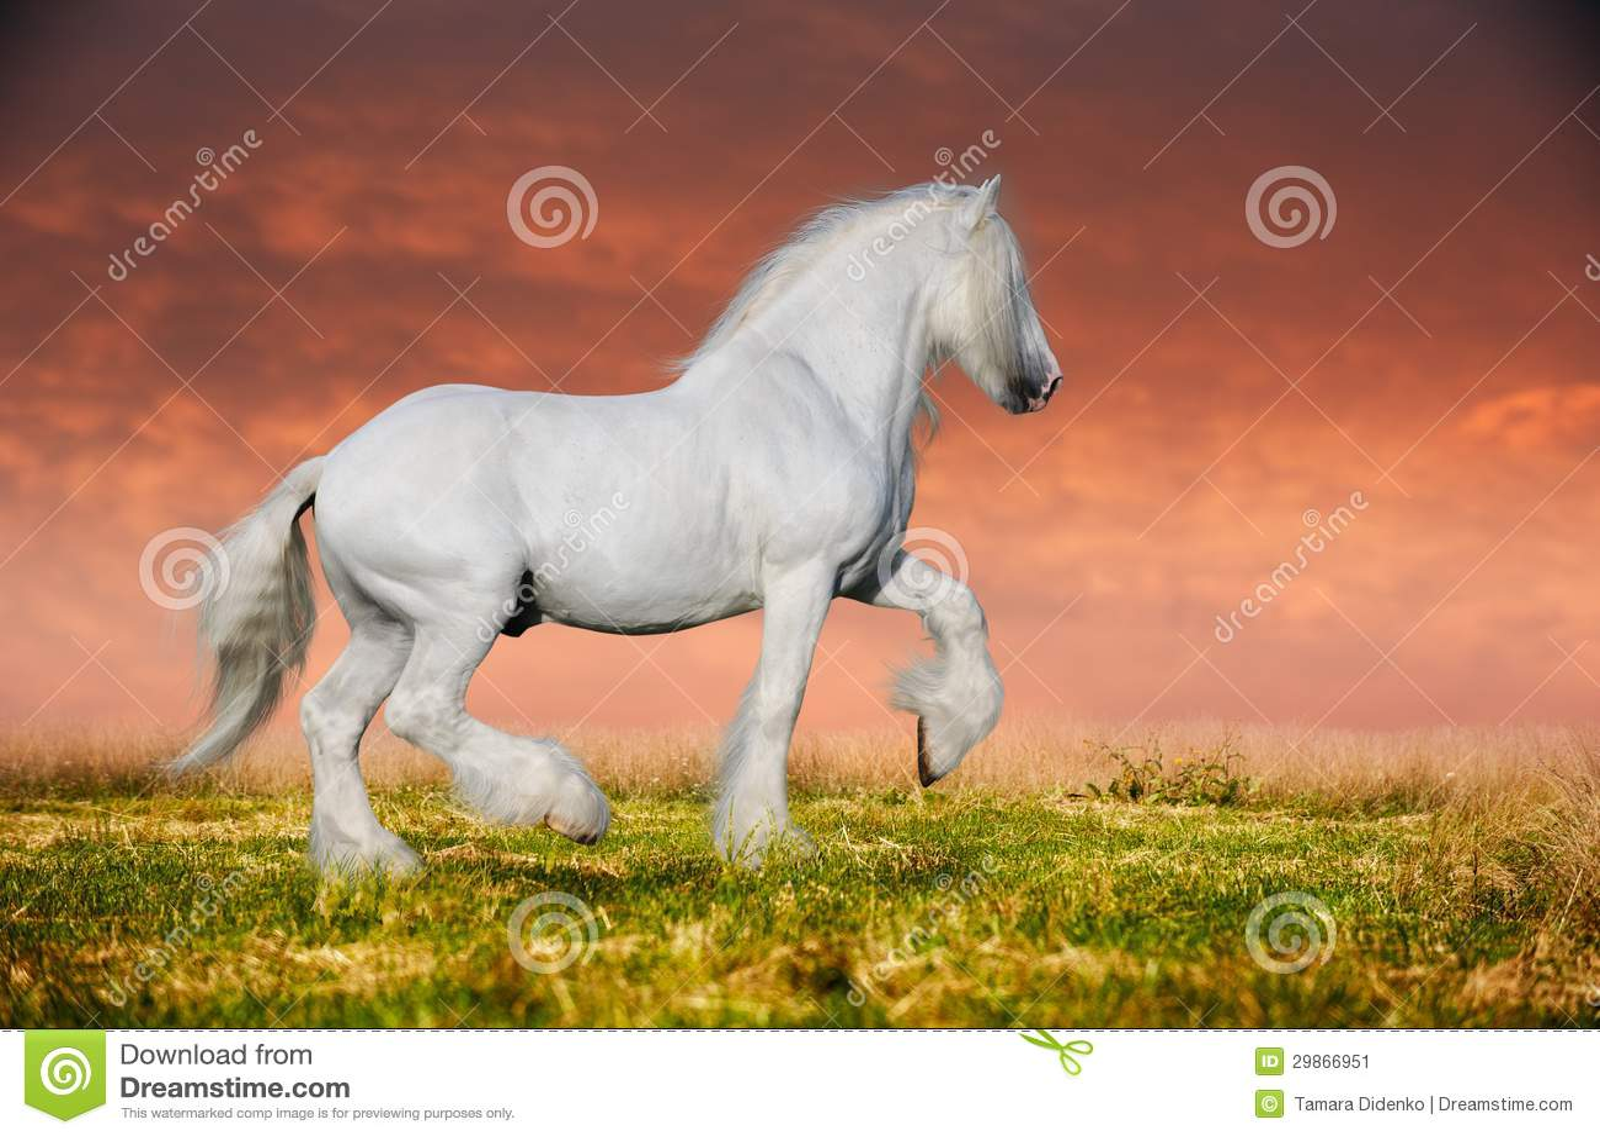 A Grey Arabian Horse Rearing Stock Image Image Of Blue Elegant 29866951